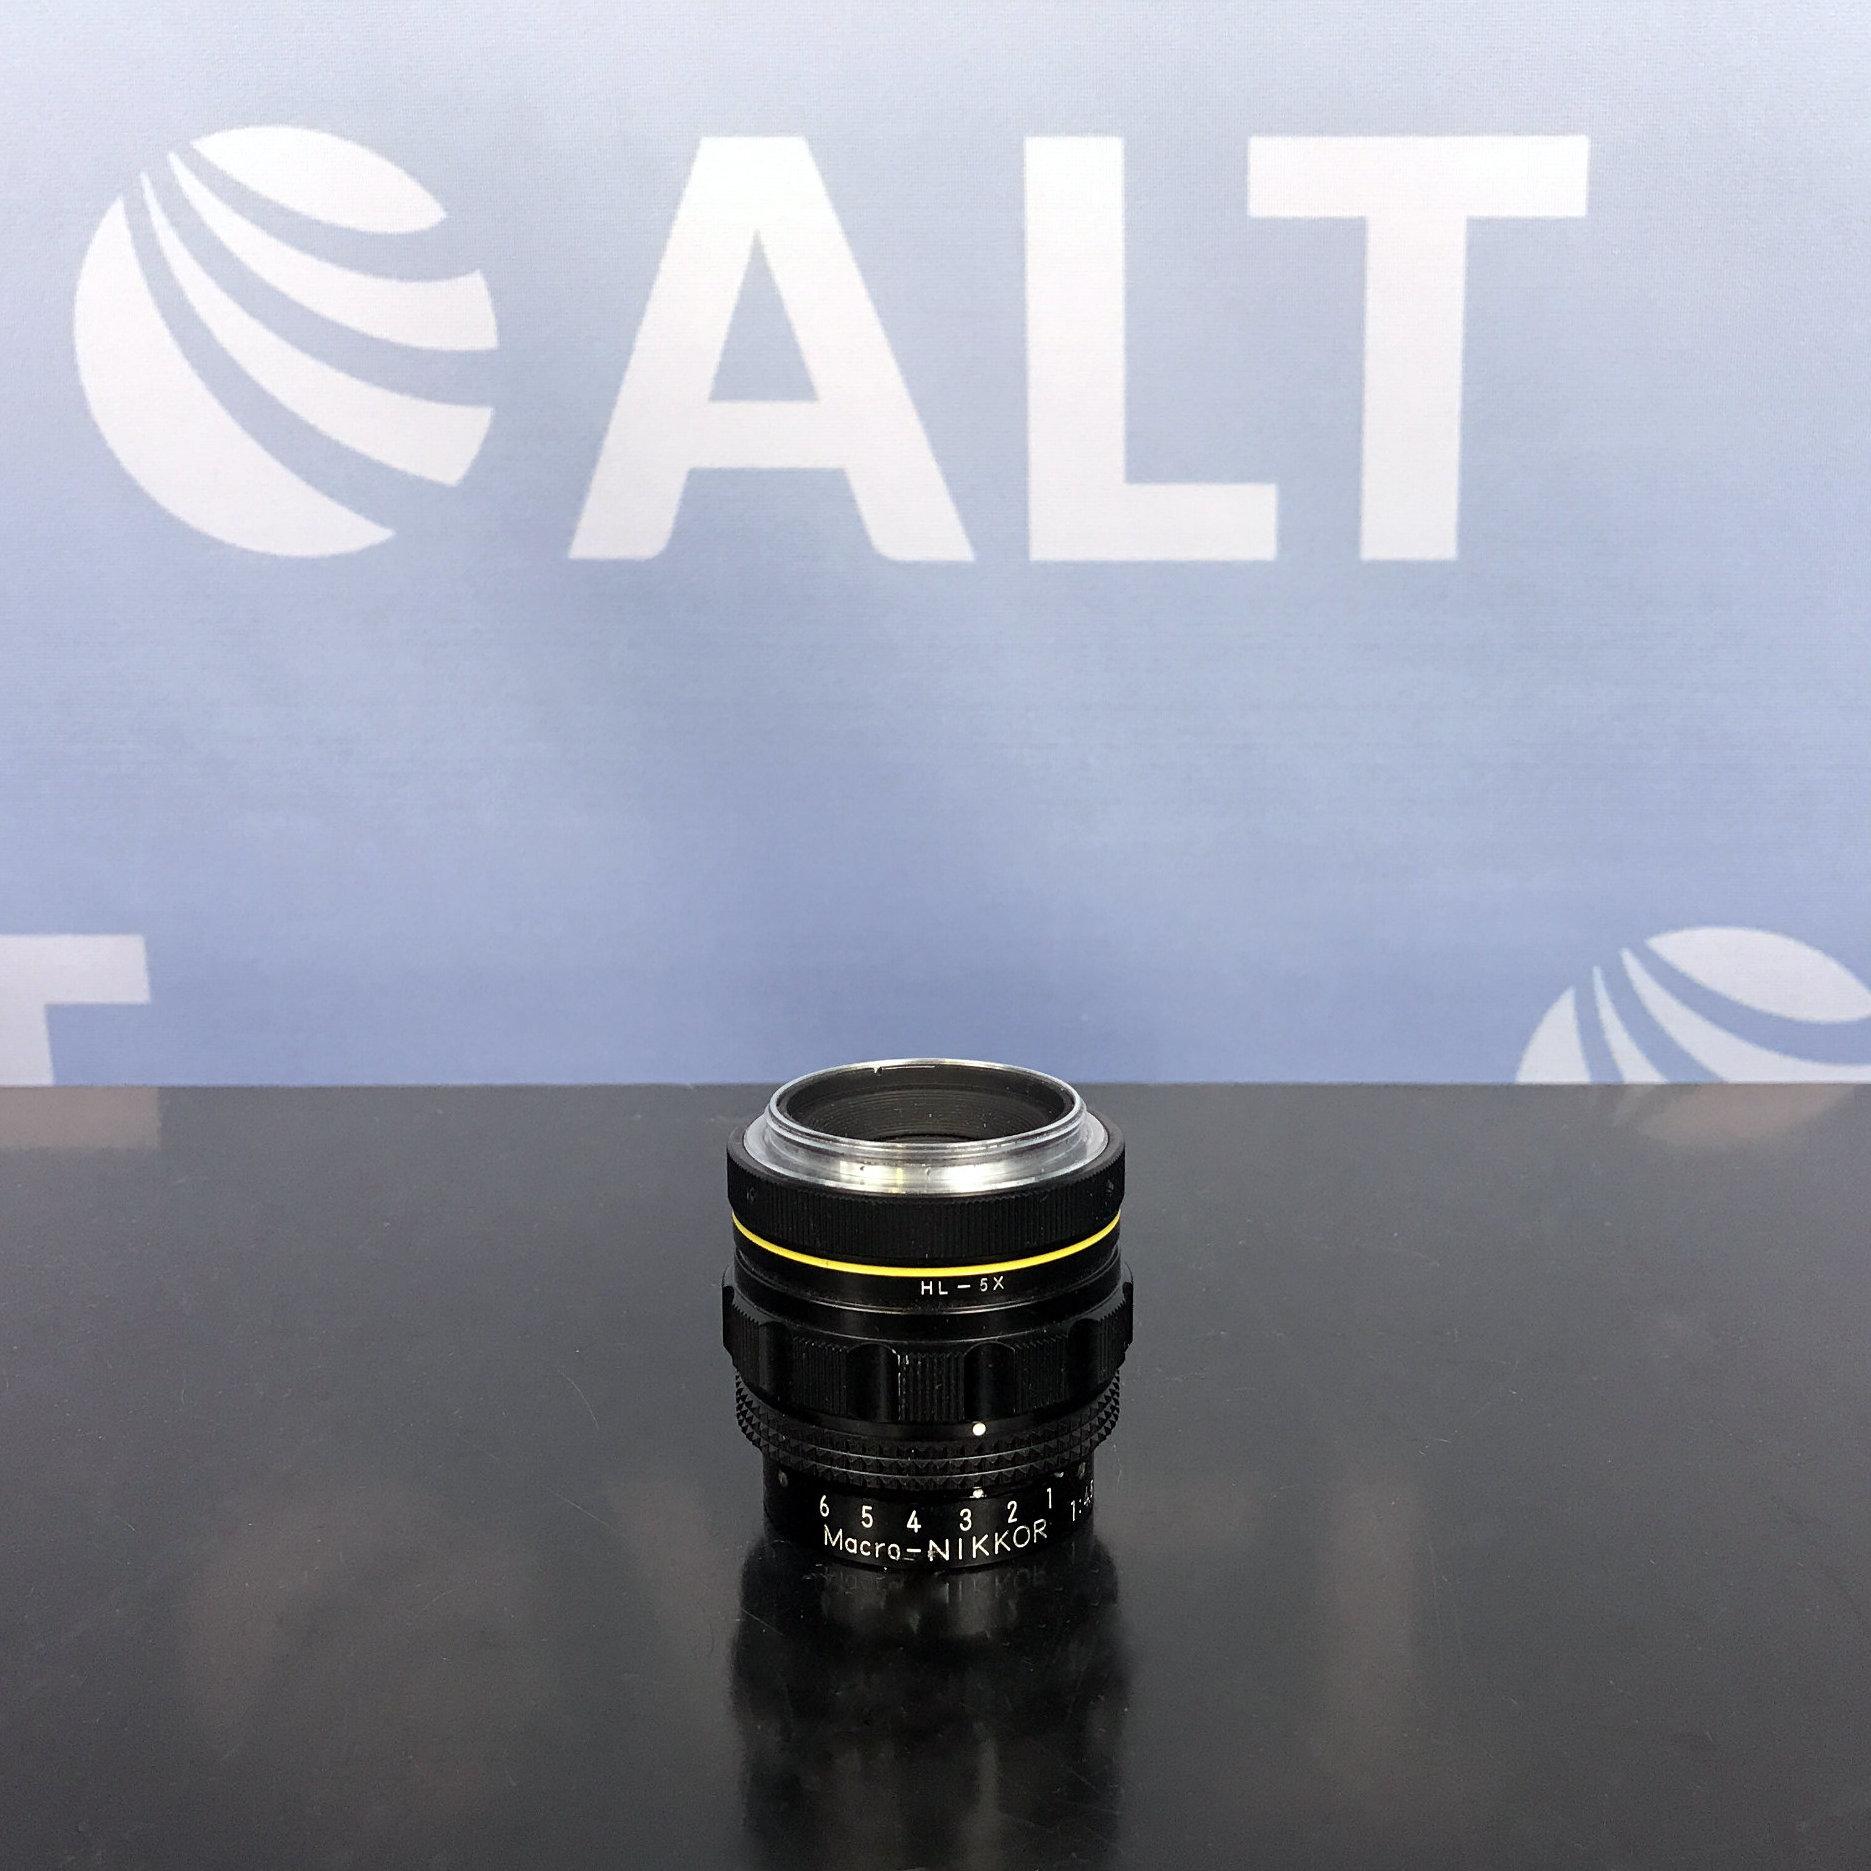 Nikon Macro-Nikkor 1:4.5  f=65mm Yellow Lined Strong Barrel Lens Image